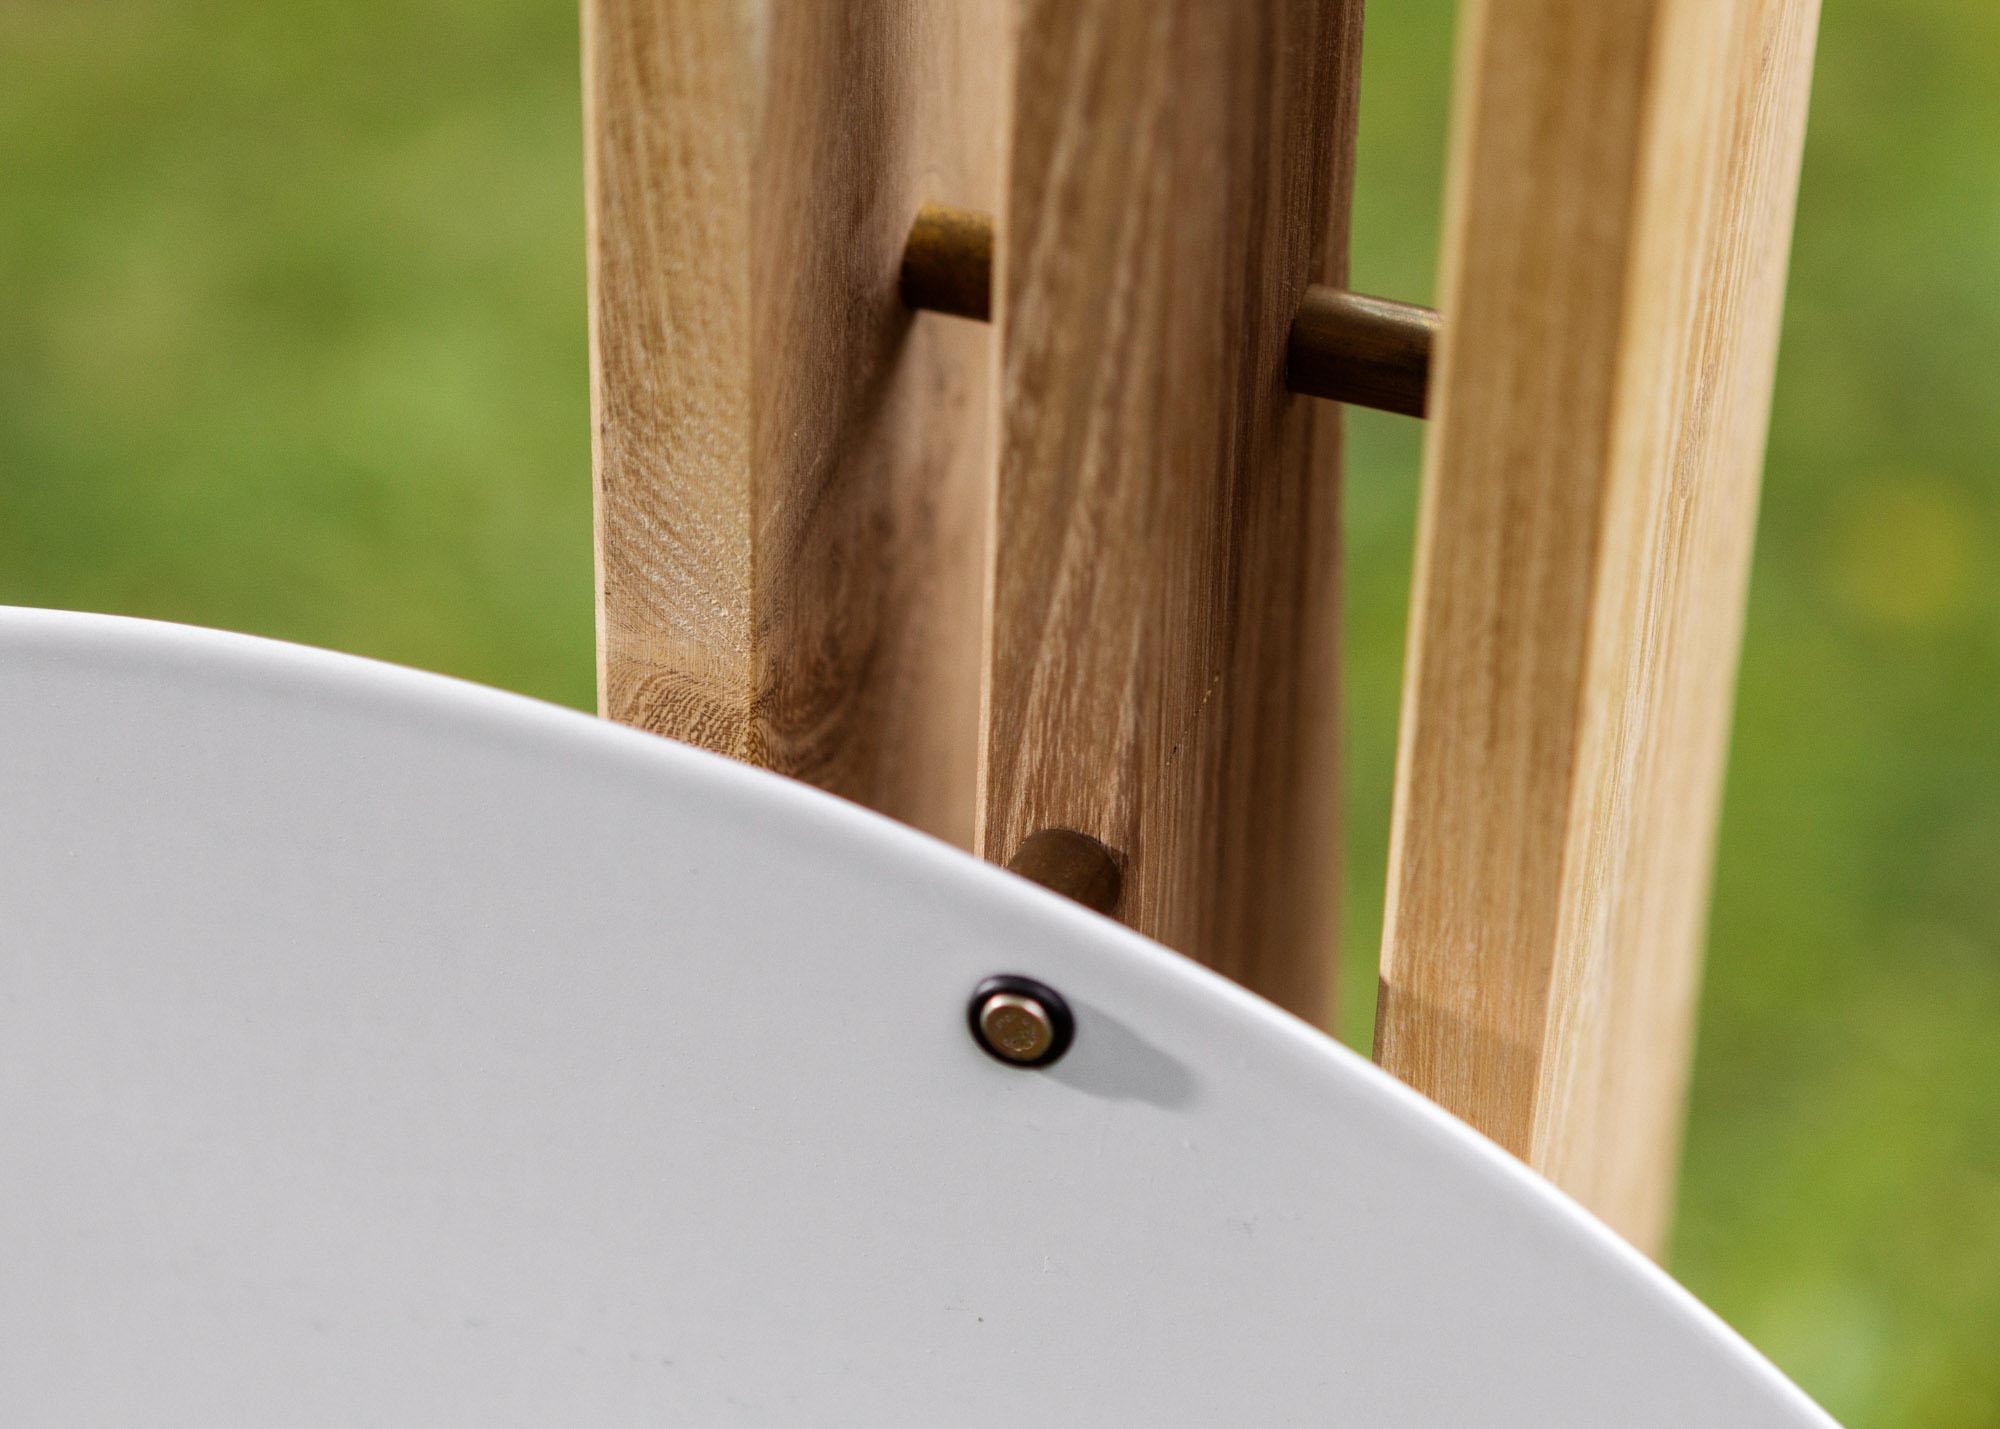 Holzgrabmal - Lamellen aus Holz als Stele mit hintersetztem Emailleschild